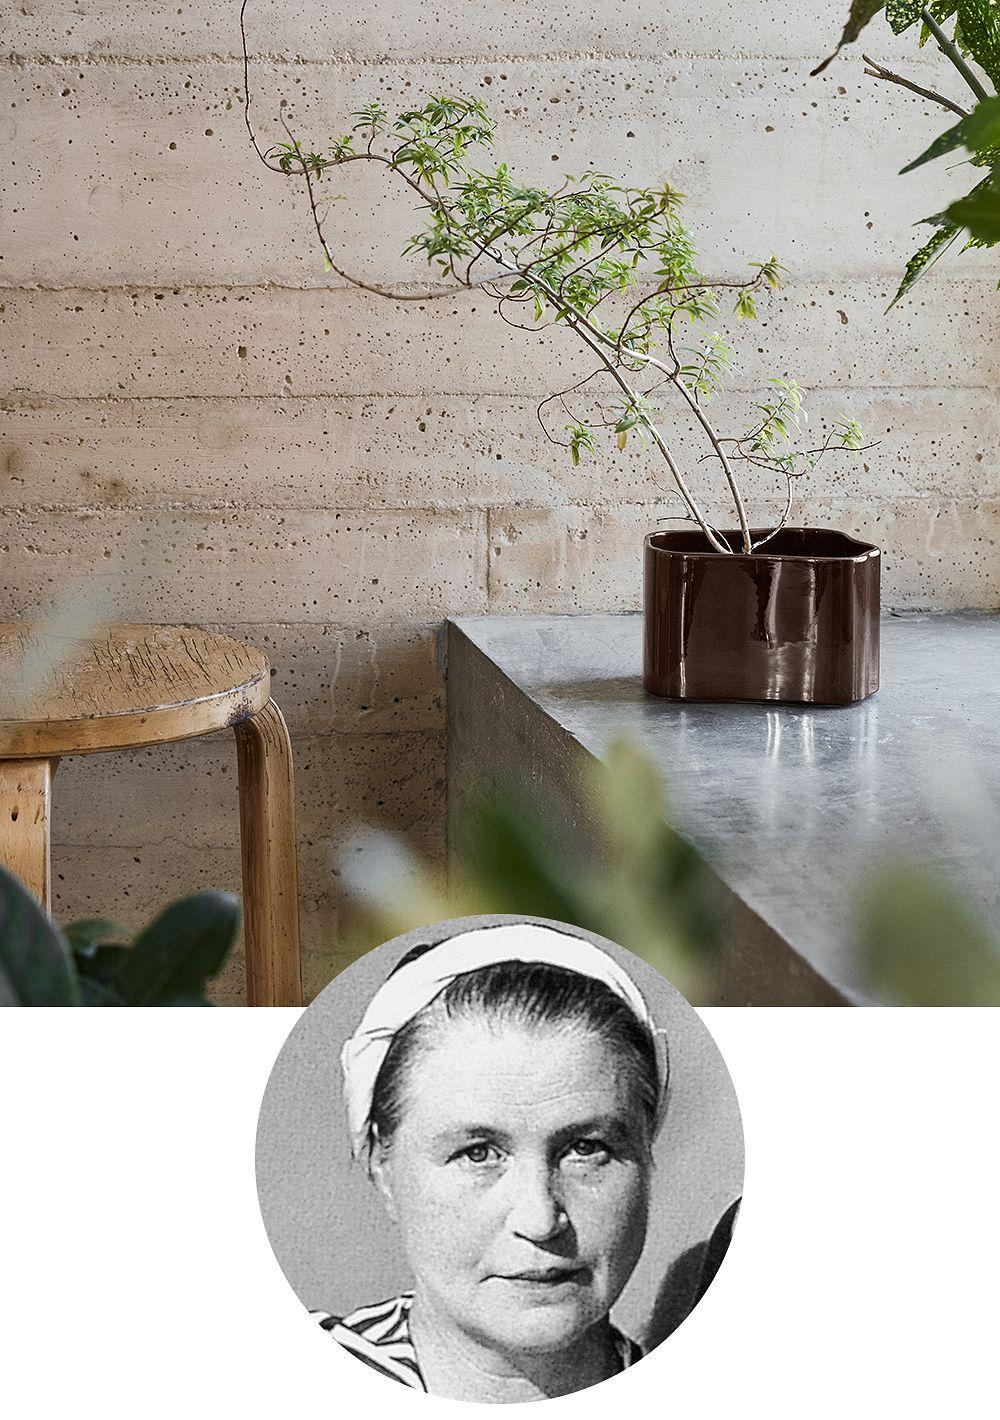 Designer Aino Aalto and her iconic Riihitie pot manufactured by Artek.